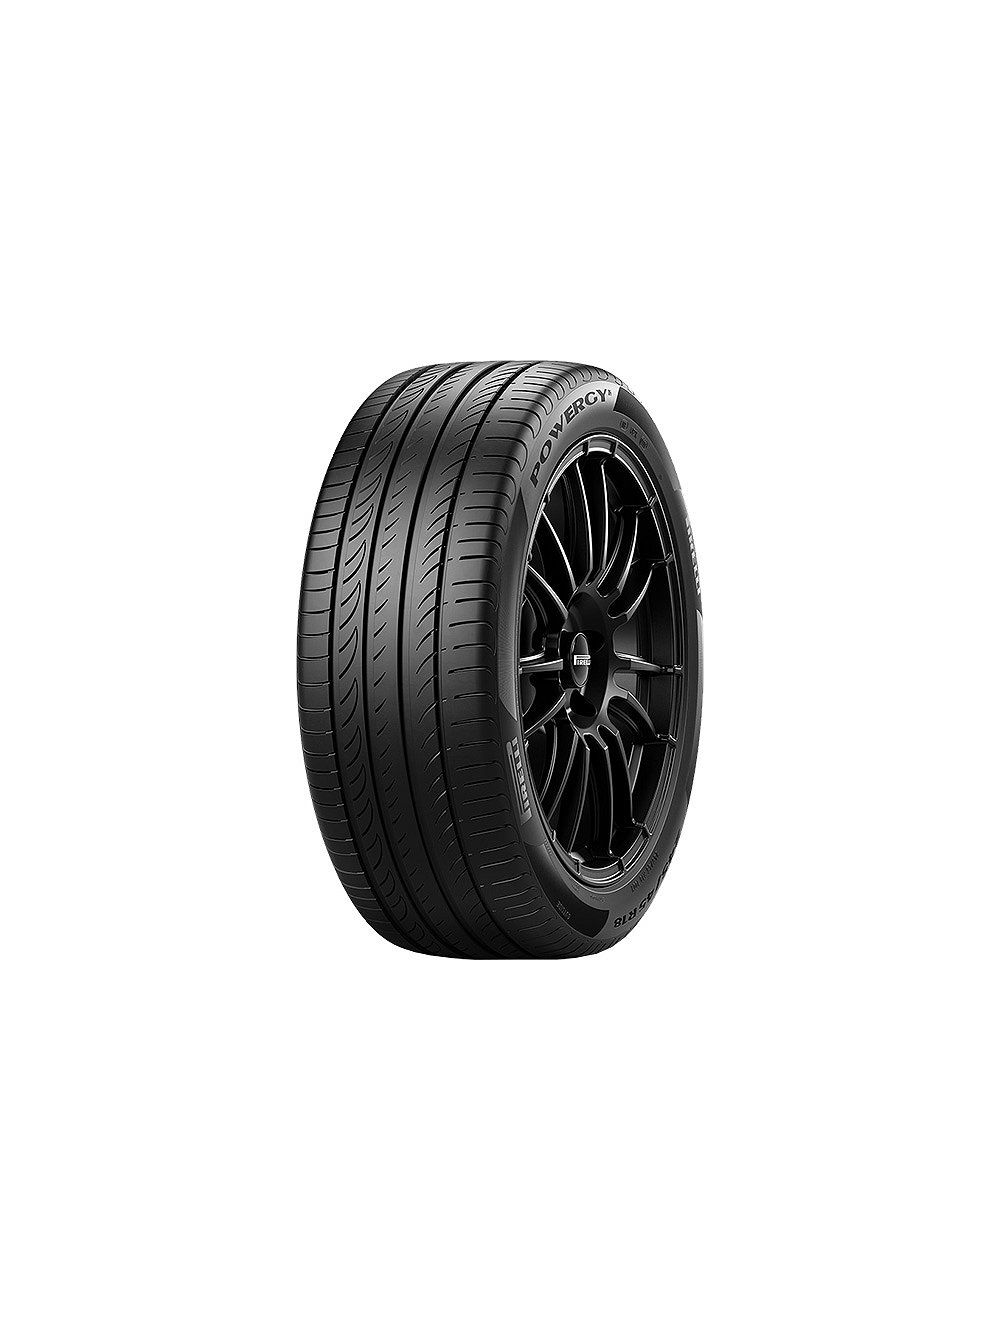 Pirelli 225/40R19 Y Powergy XL Nyári gumi